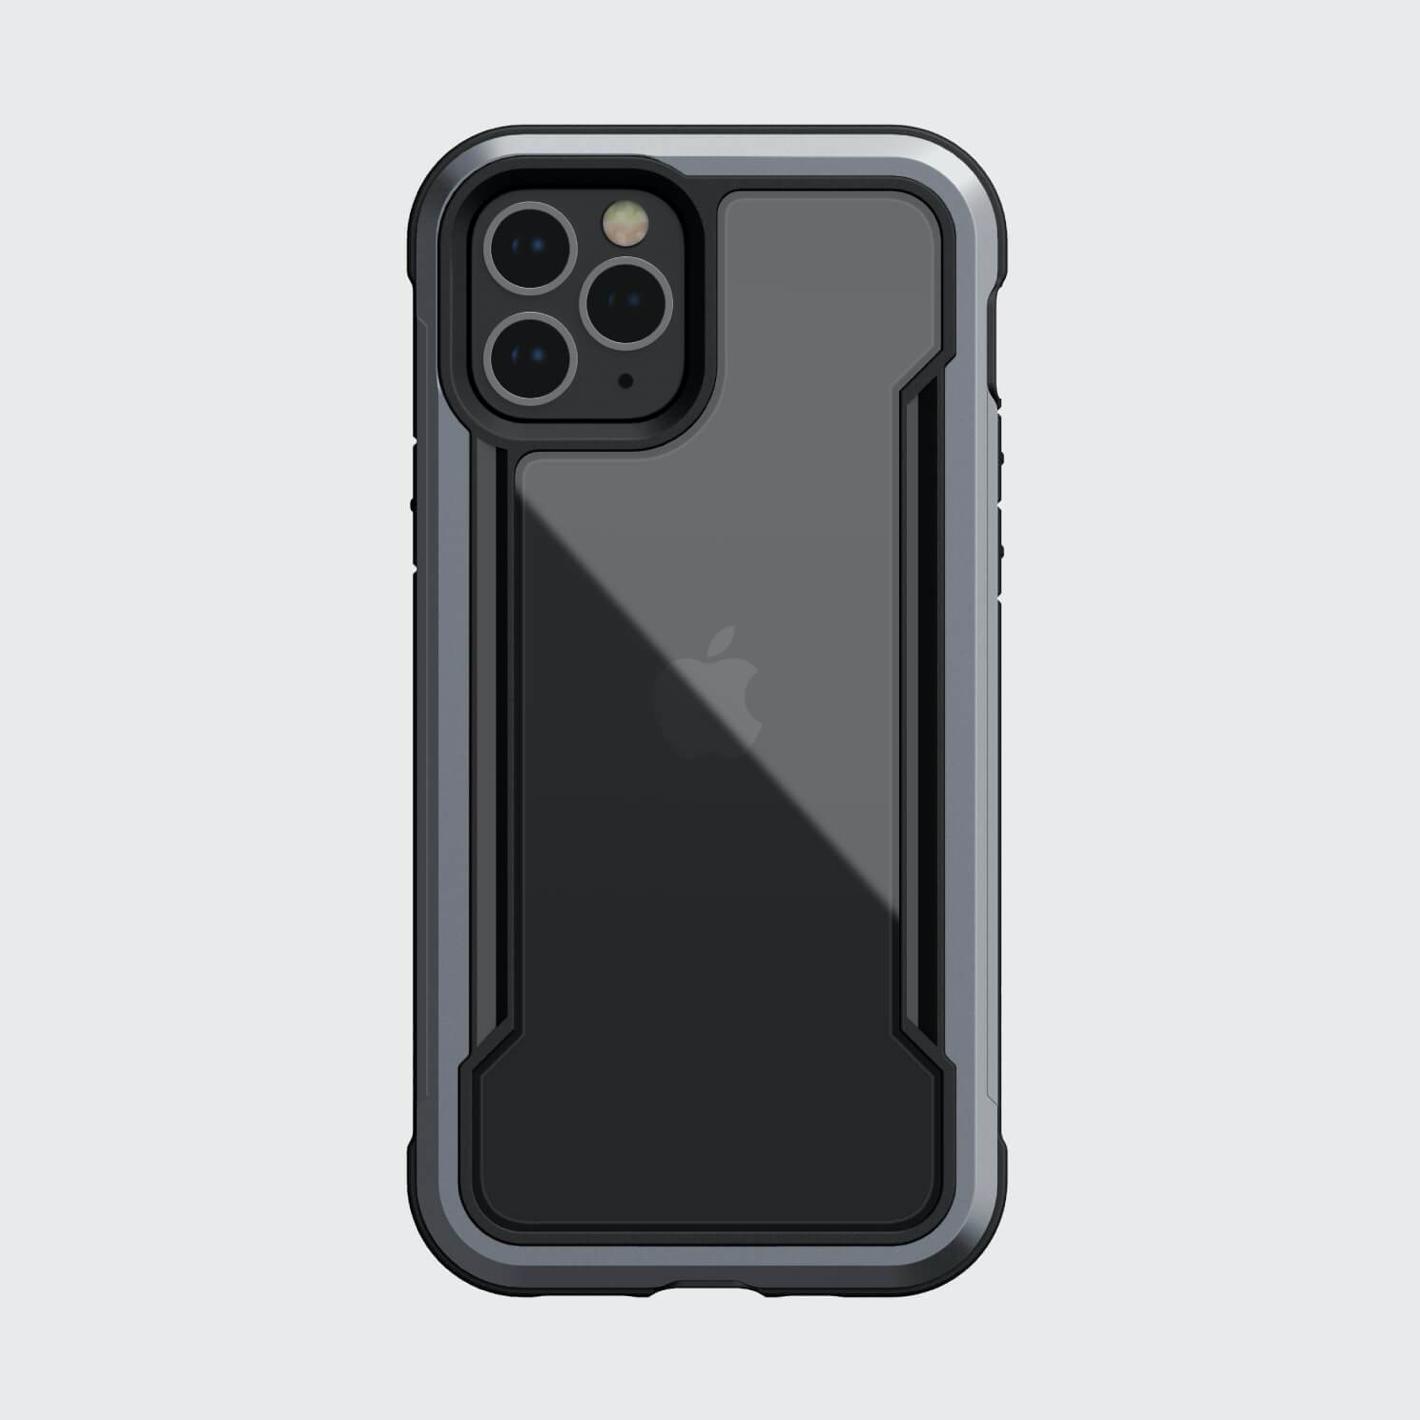 Estuche XDORIA Raptic Shield Negro - IPHONE 12 MINI 5.4